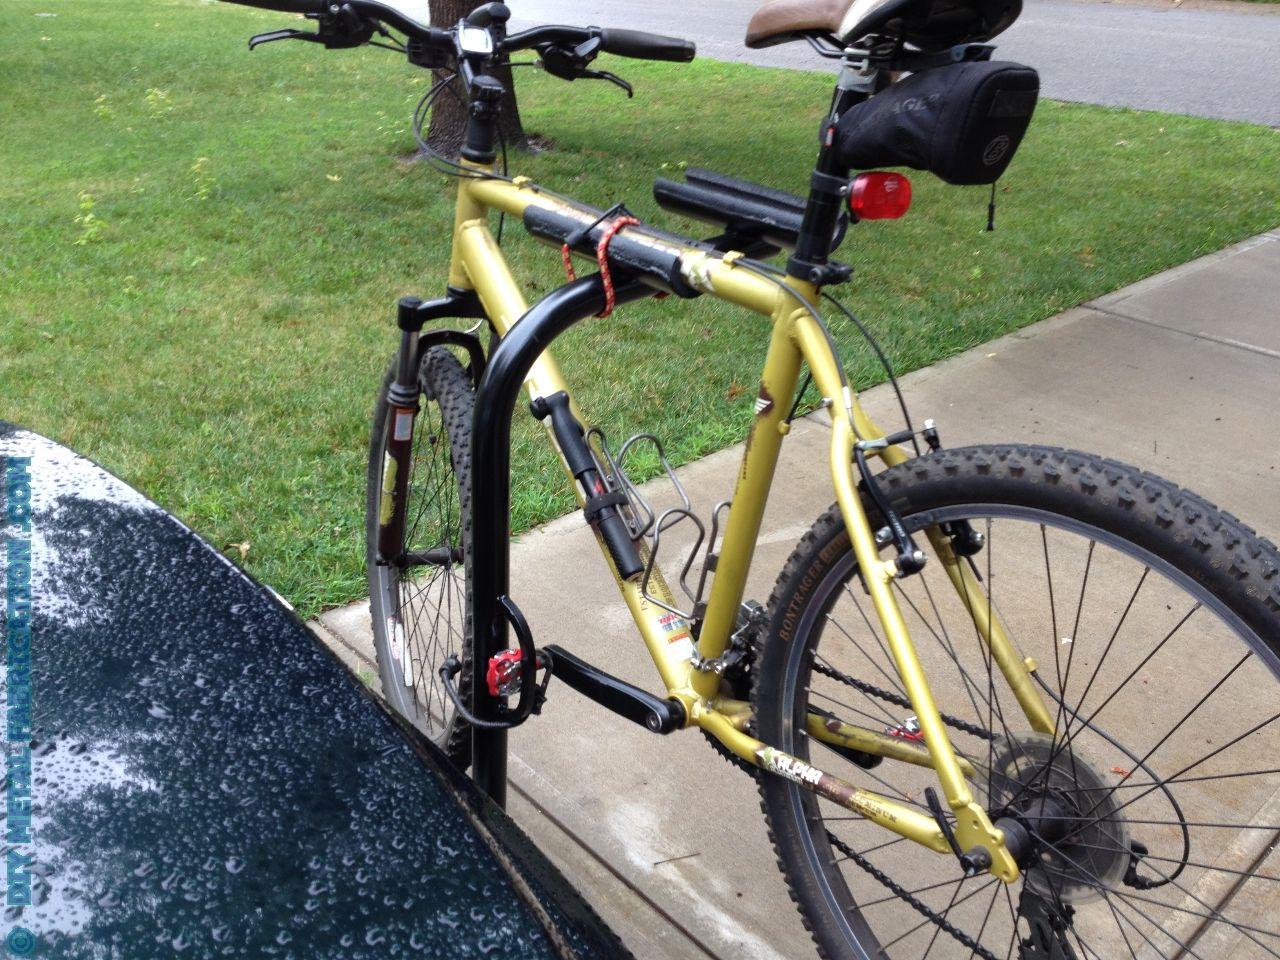 How To Build Receiver Hitch Bike Rack Diy Bike Rack Hitch